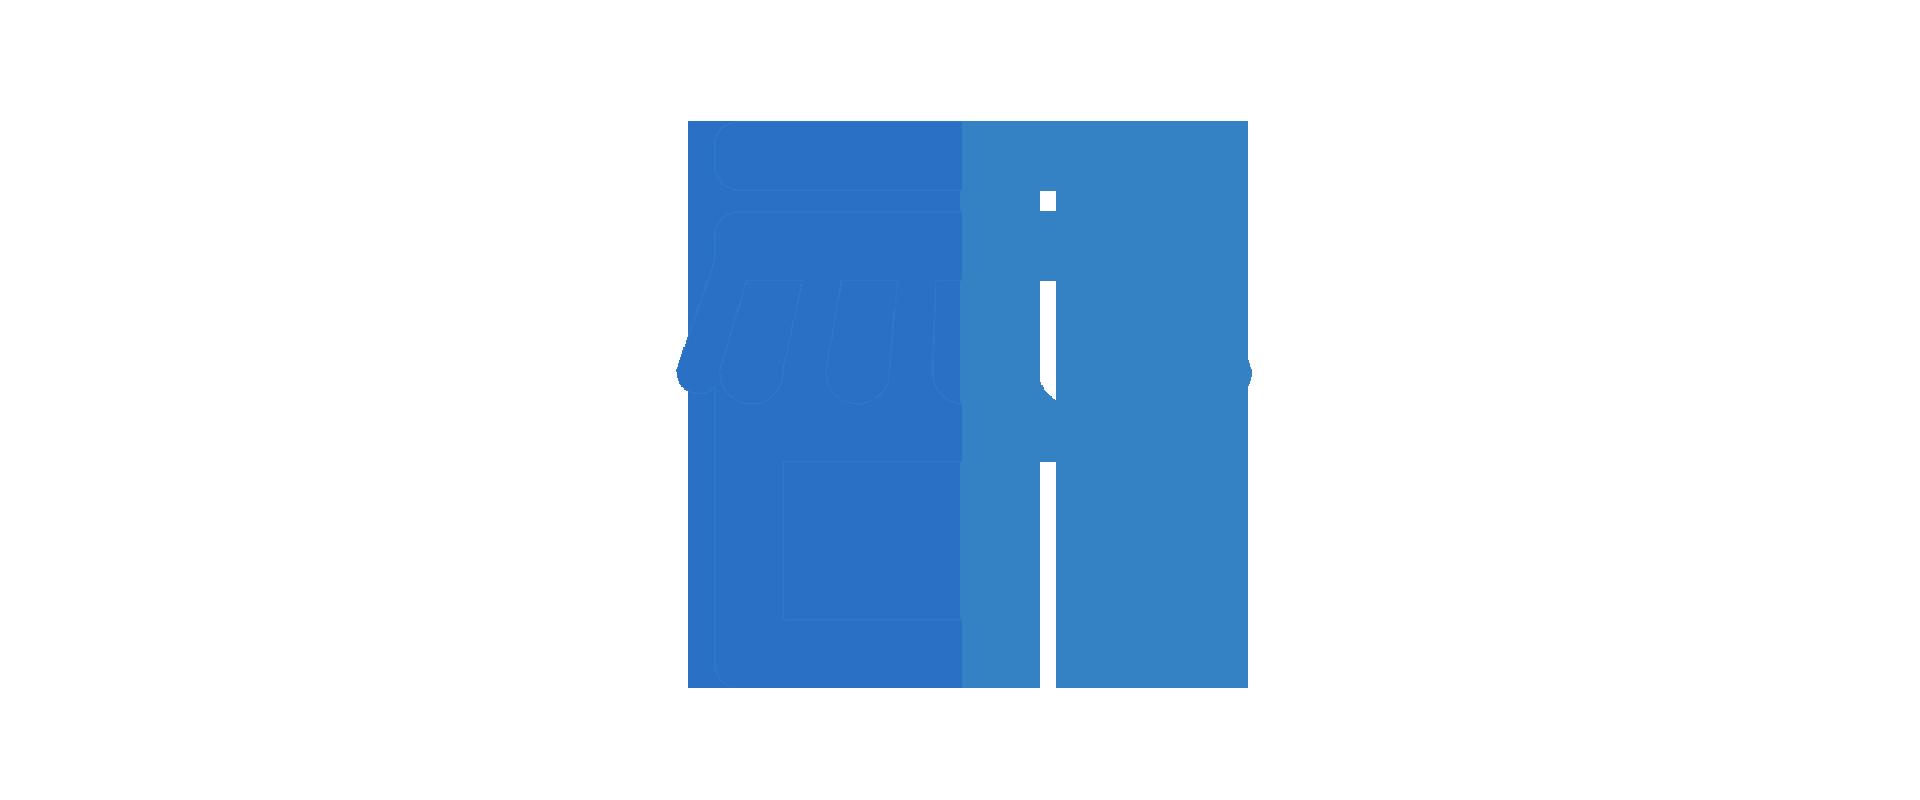 Store visits